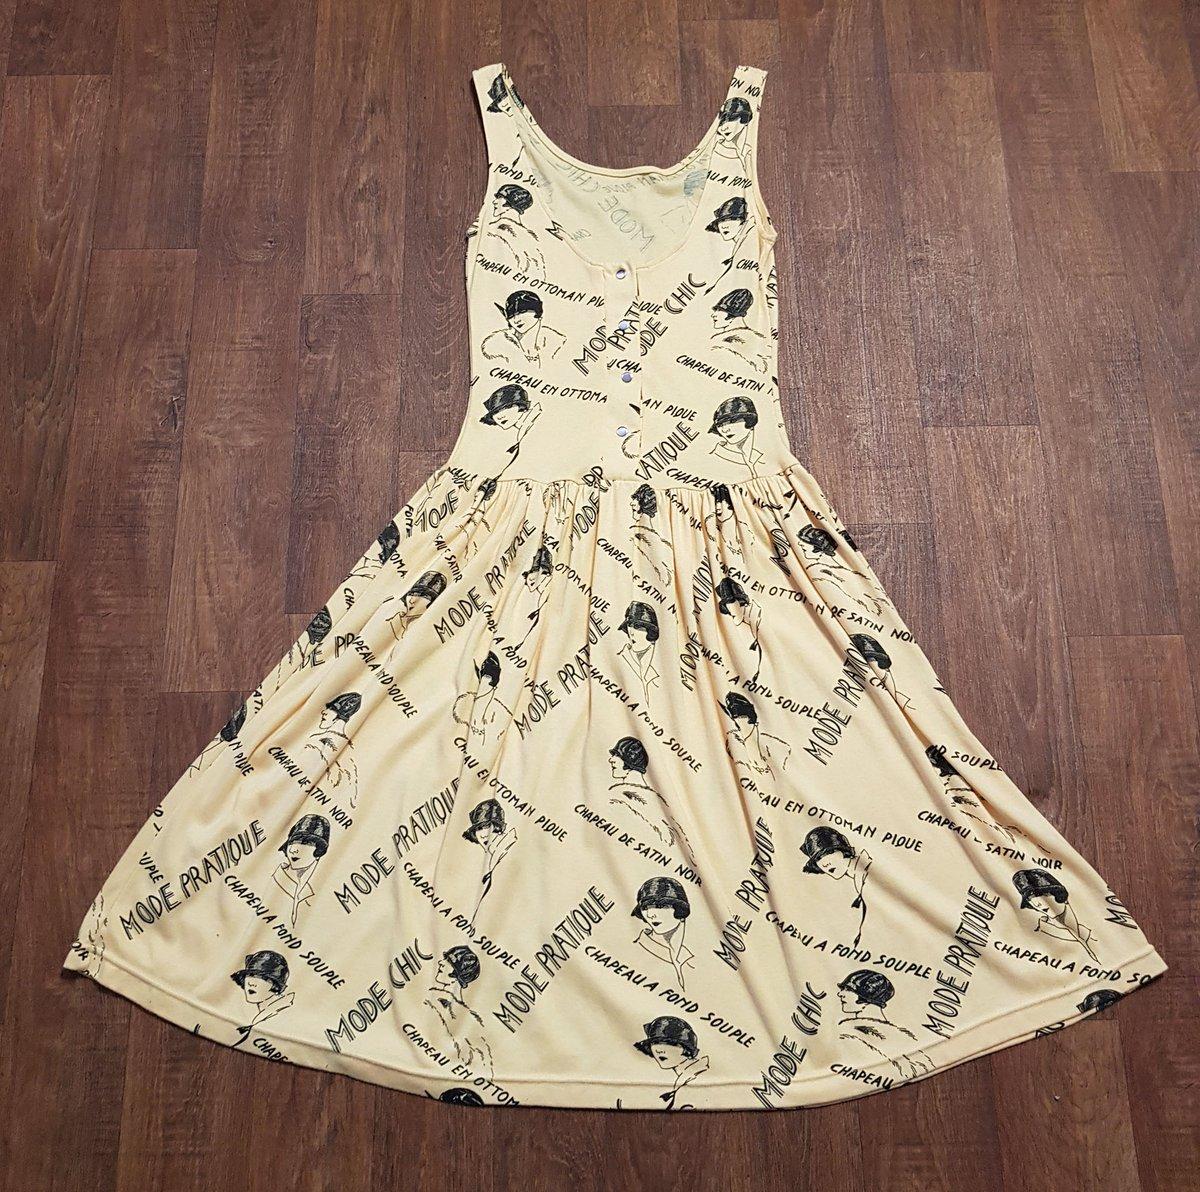 1980s Vintage Yellow French Print Summer Dress UK Size 10  https://www.myvintage.uk/product-page/1980s-vintage-yellow-french-print-summer-dress-uk-size-10… #vintage #vintagedress #vintagedresses #dress #vintageclothing #vintagestyle #vintagefashion #vintageshop #retro #uniquevintage #MyVintagepic.twitter.com/glkCUcI4xw